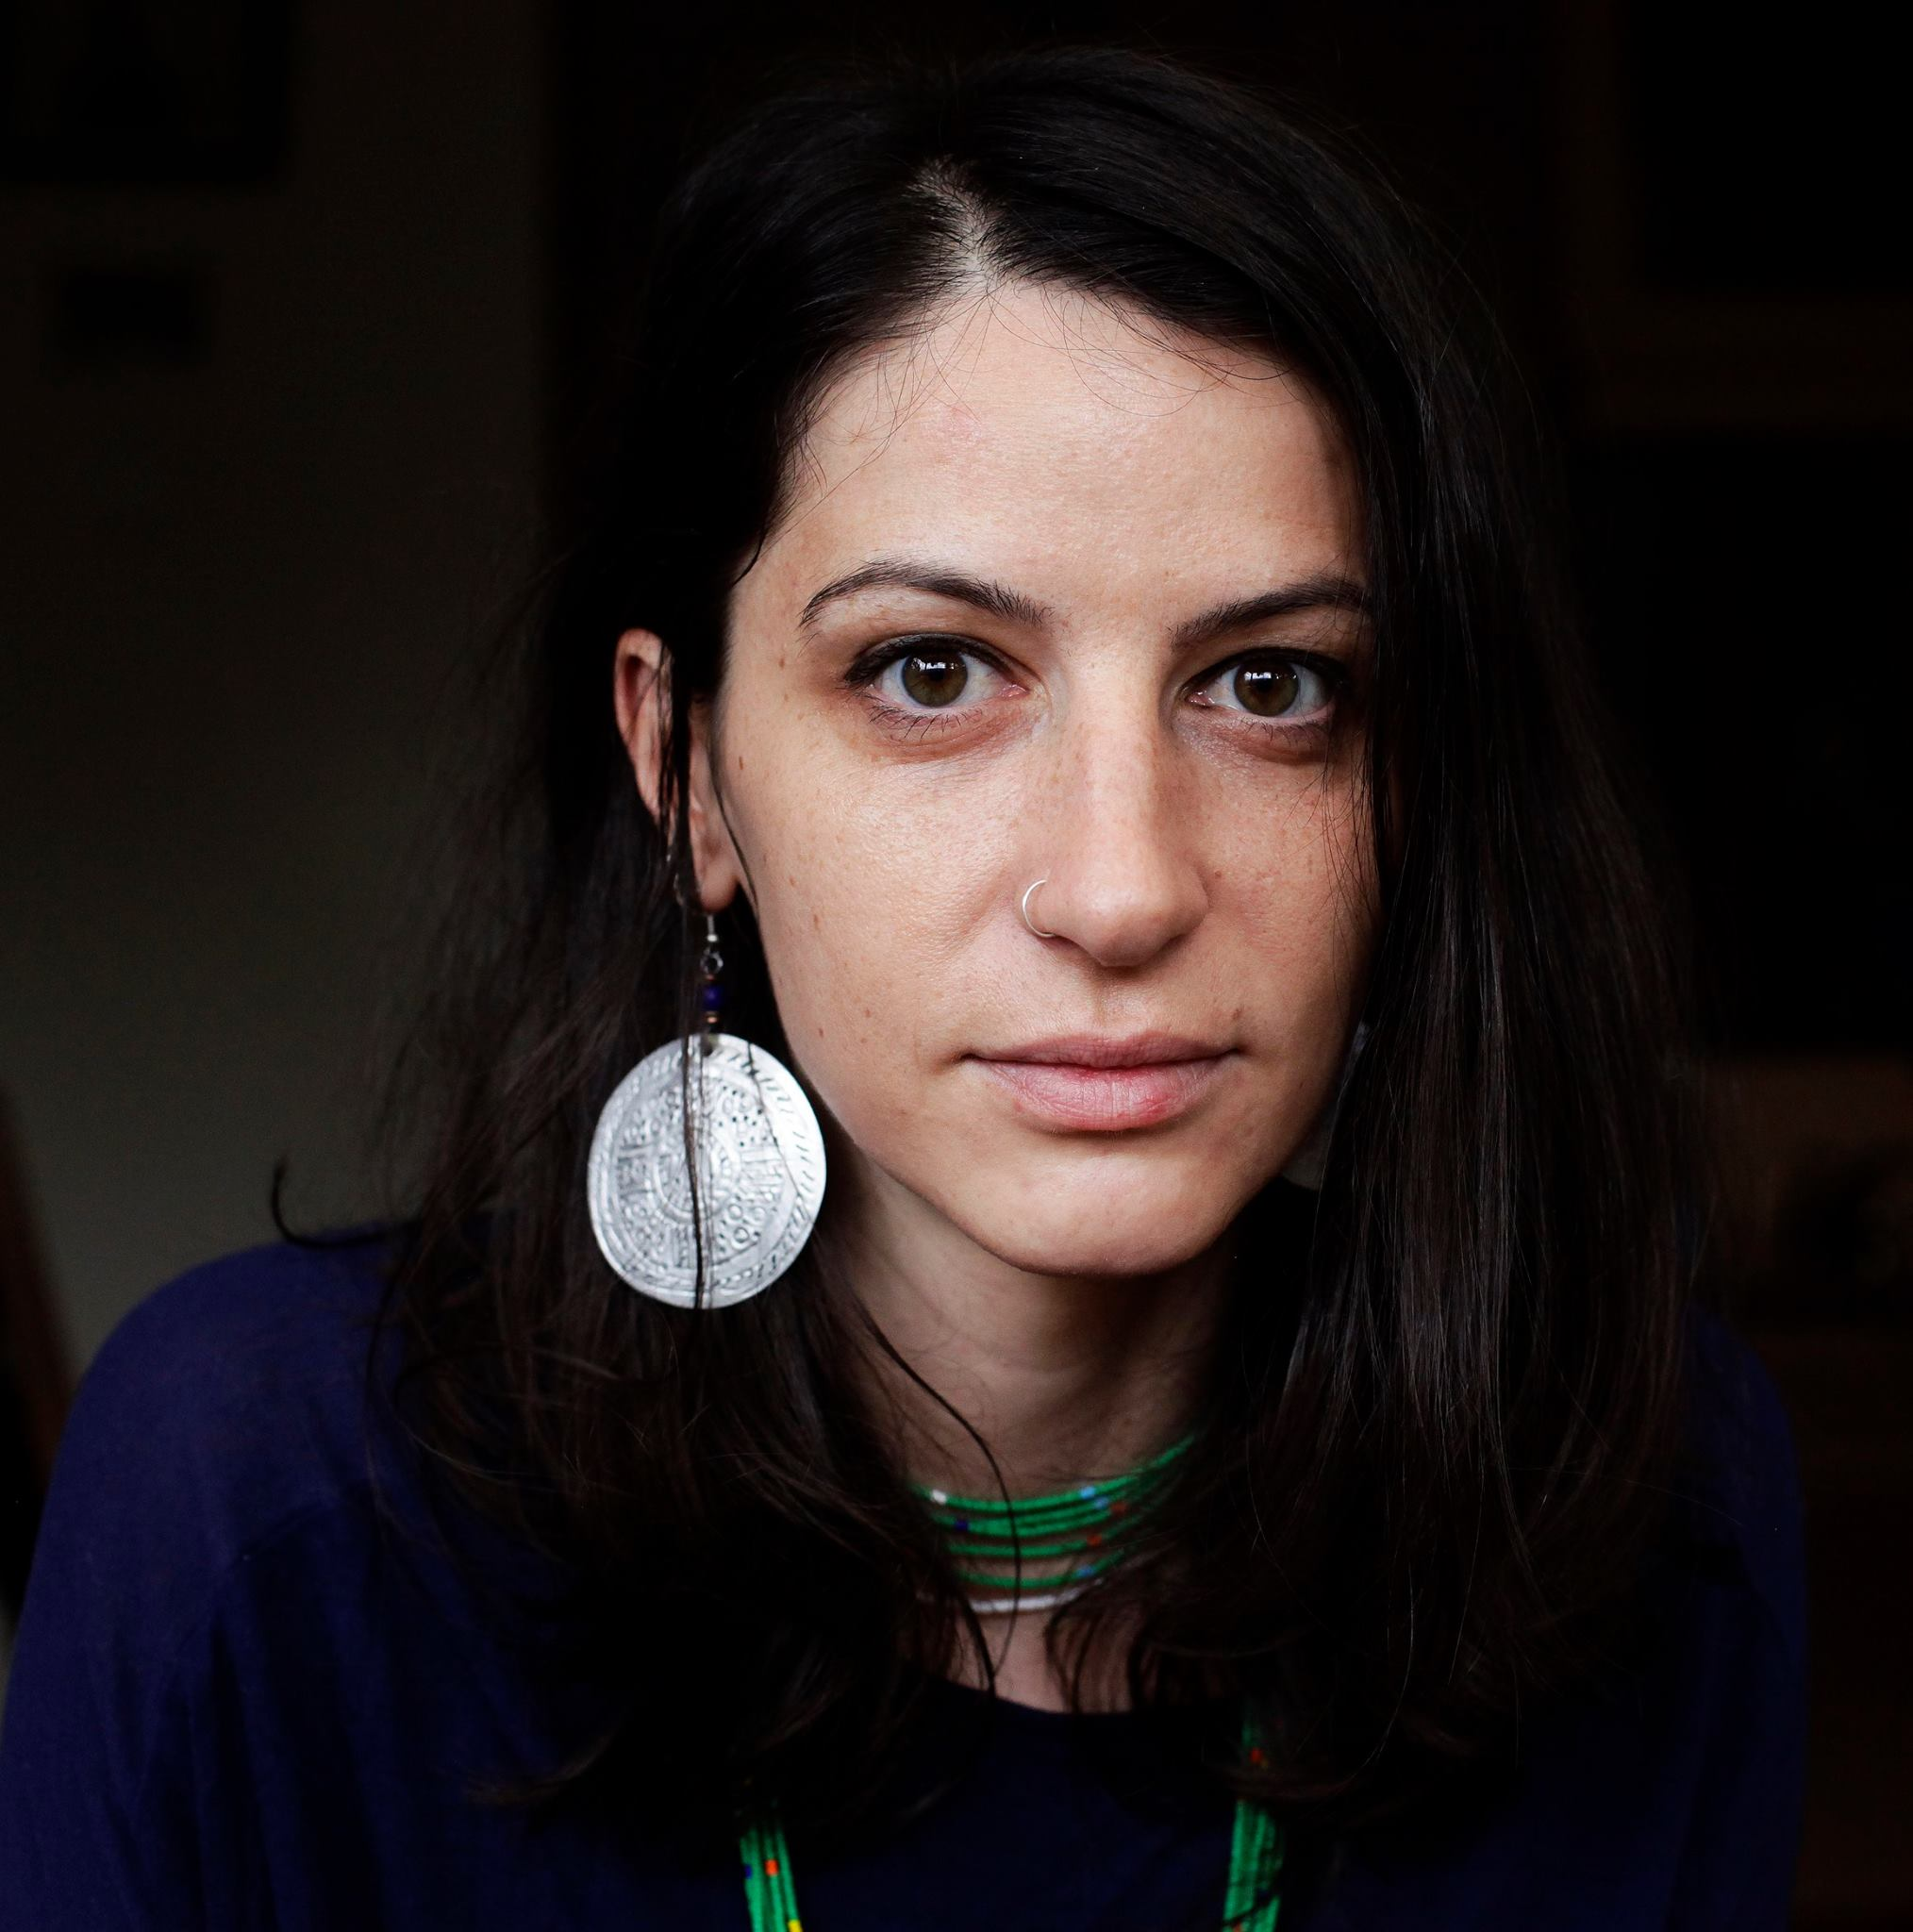 Andreea Campeanu